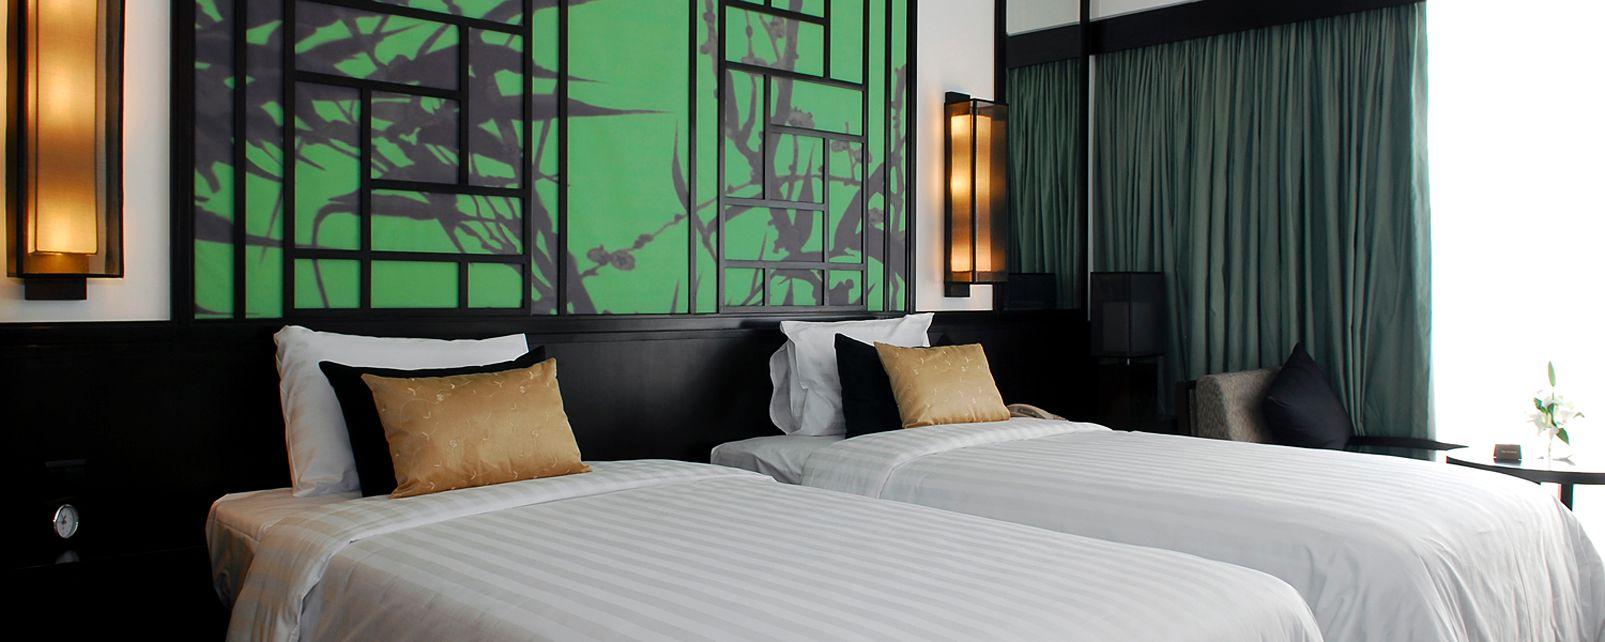 Hôtel Novotel Ha Long Bay